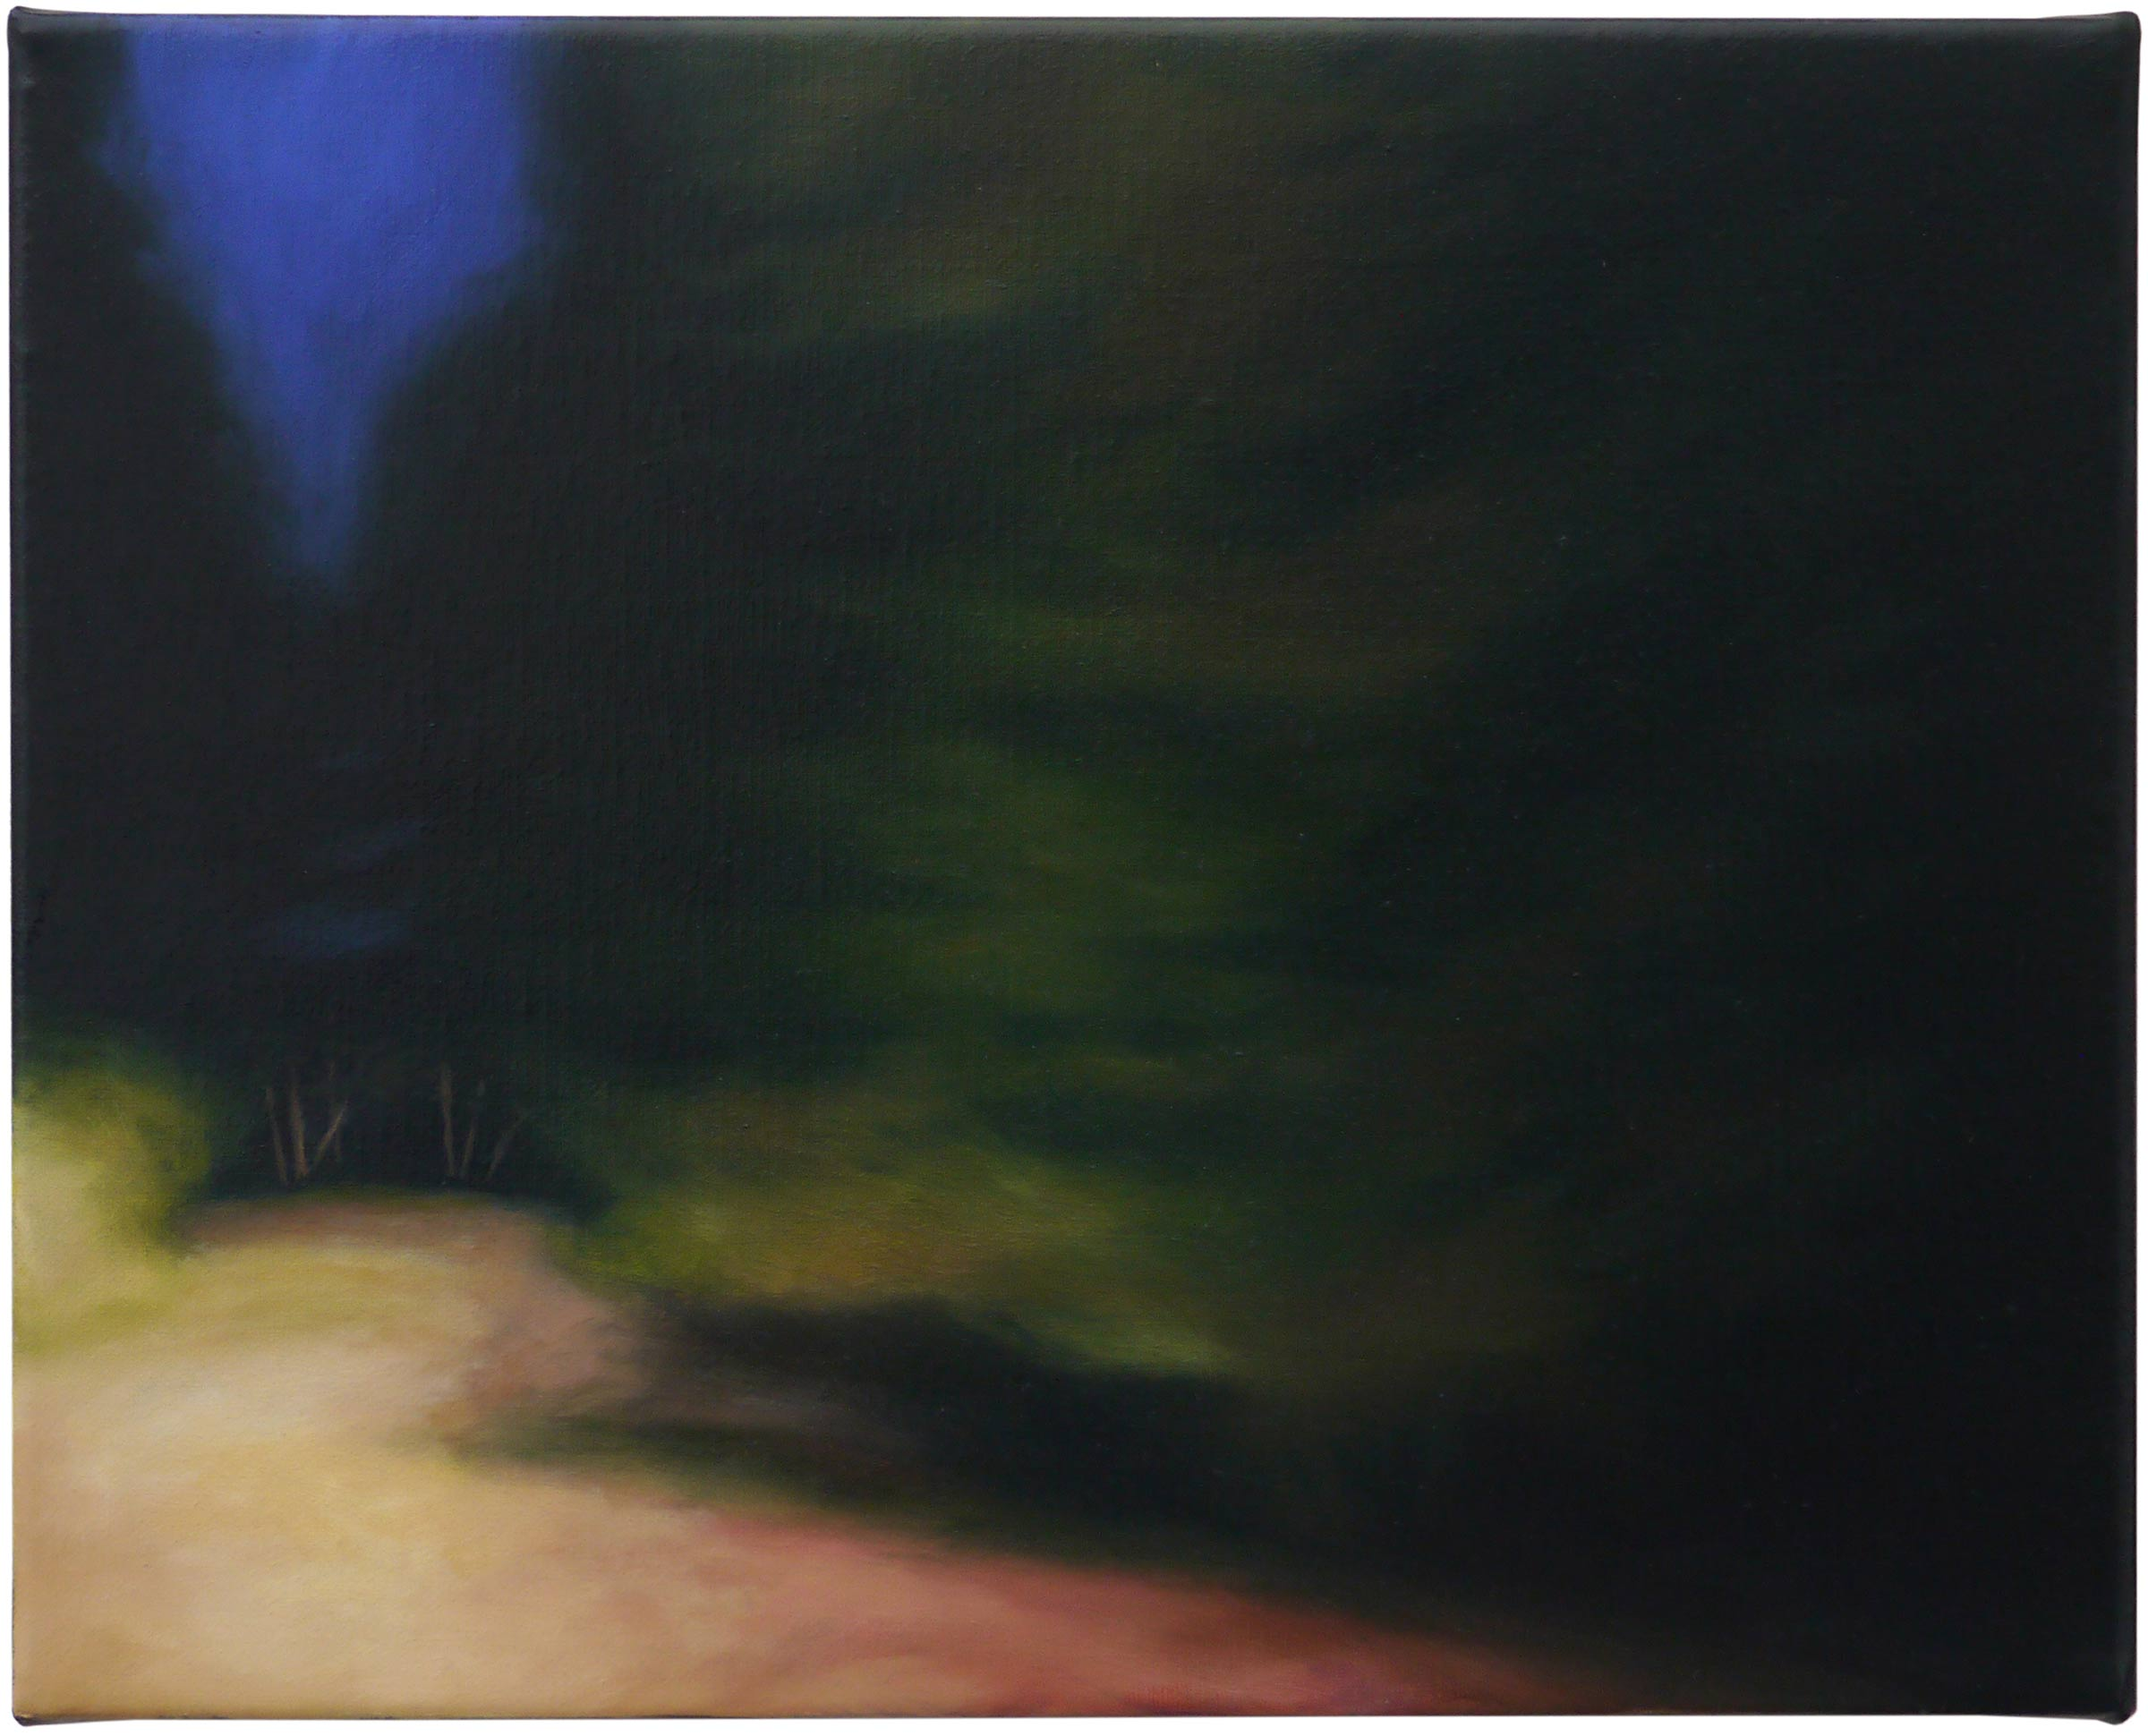 The shadows beyond 4, oil on linen, 30cm x 24cm, 2021